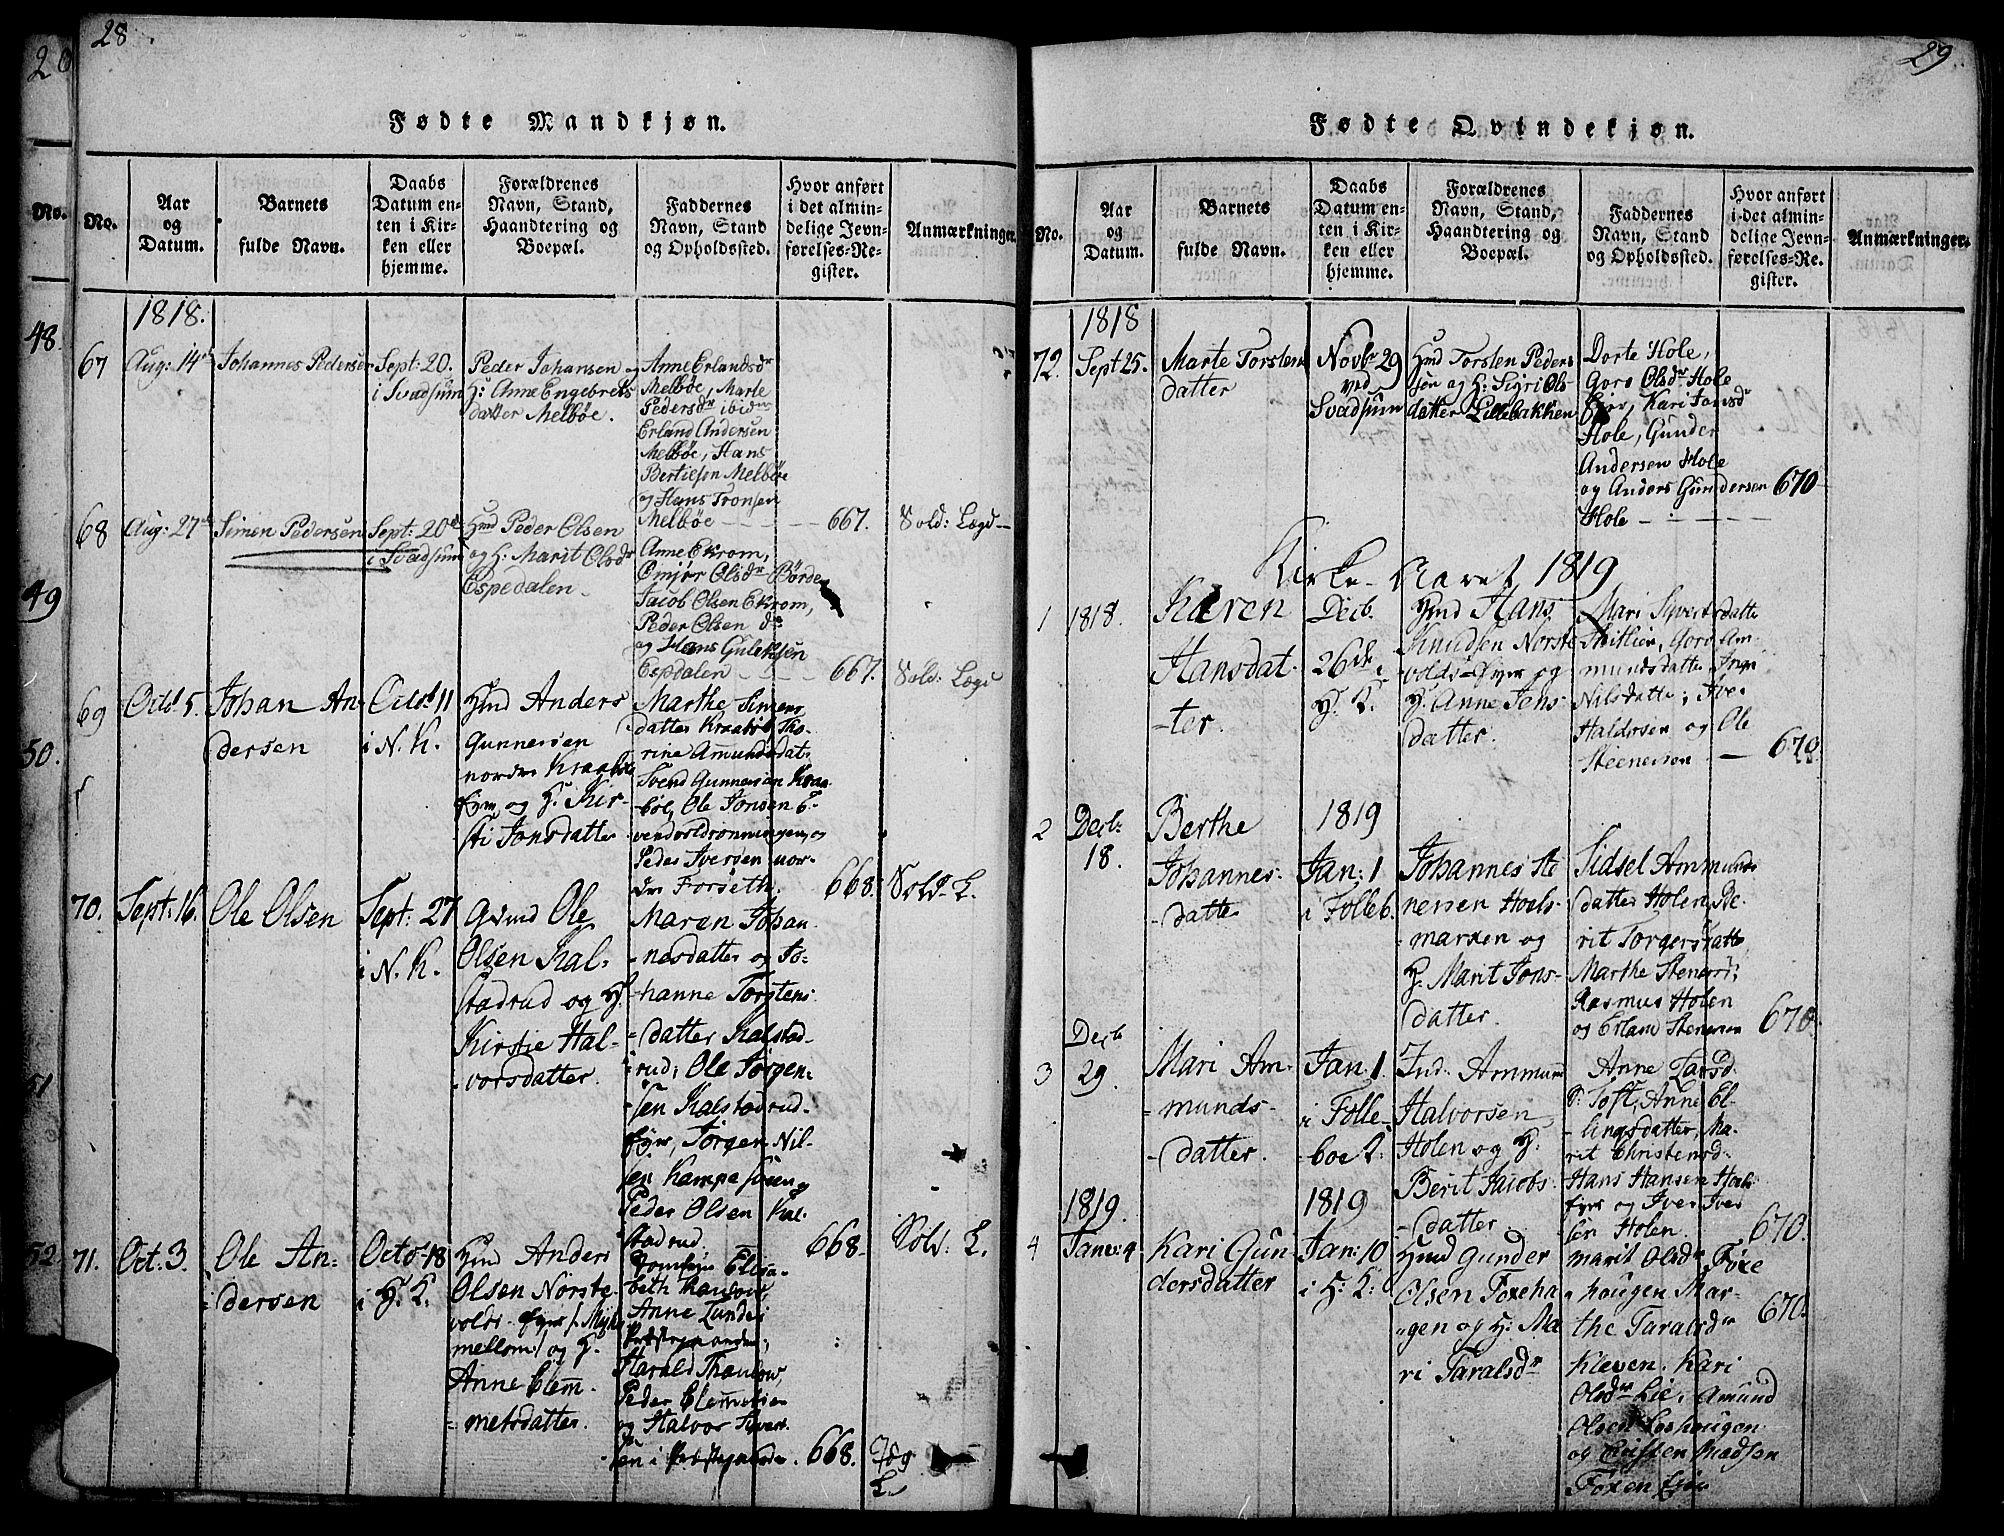 SAH, Gausdal prestekontor, Ministerialbok nr. 5, 1817-1829, s. 28-29